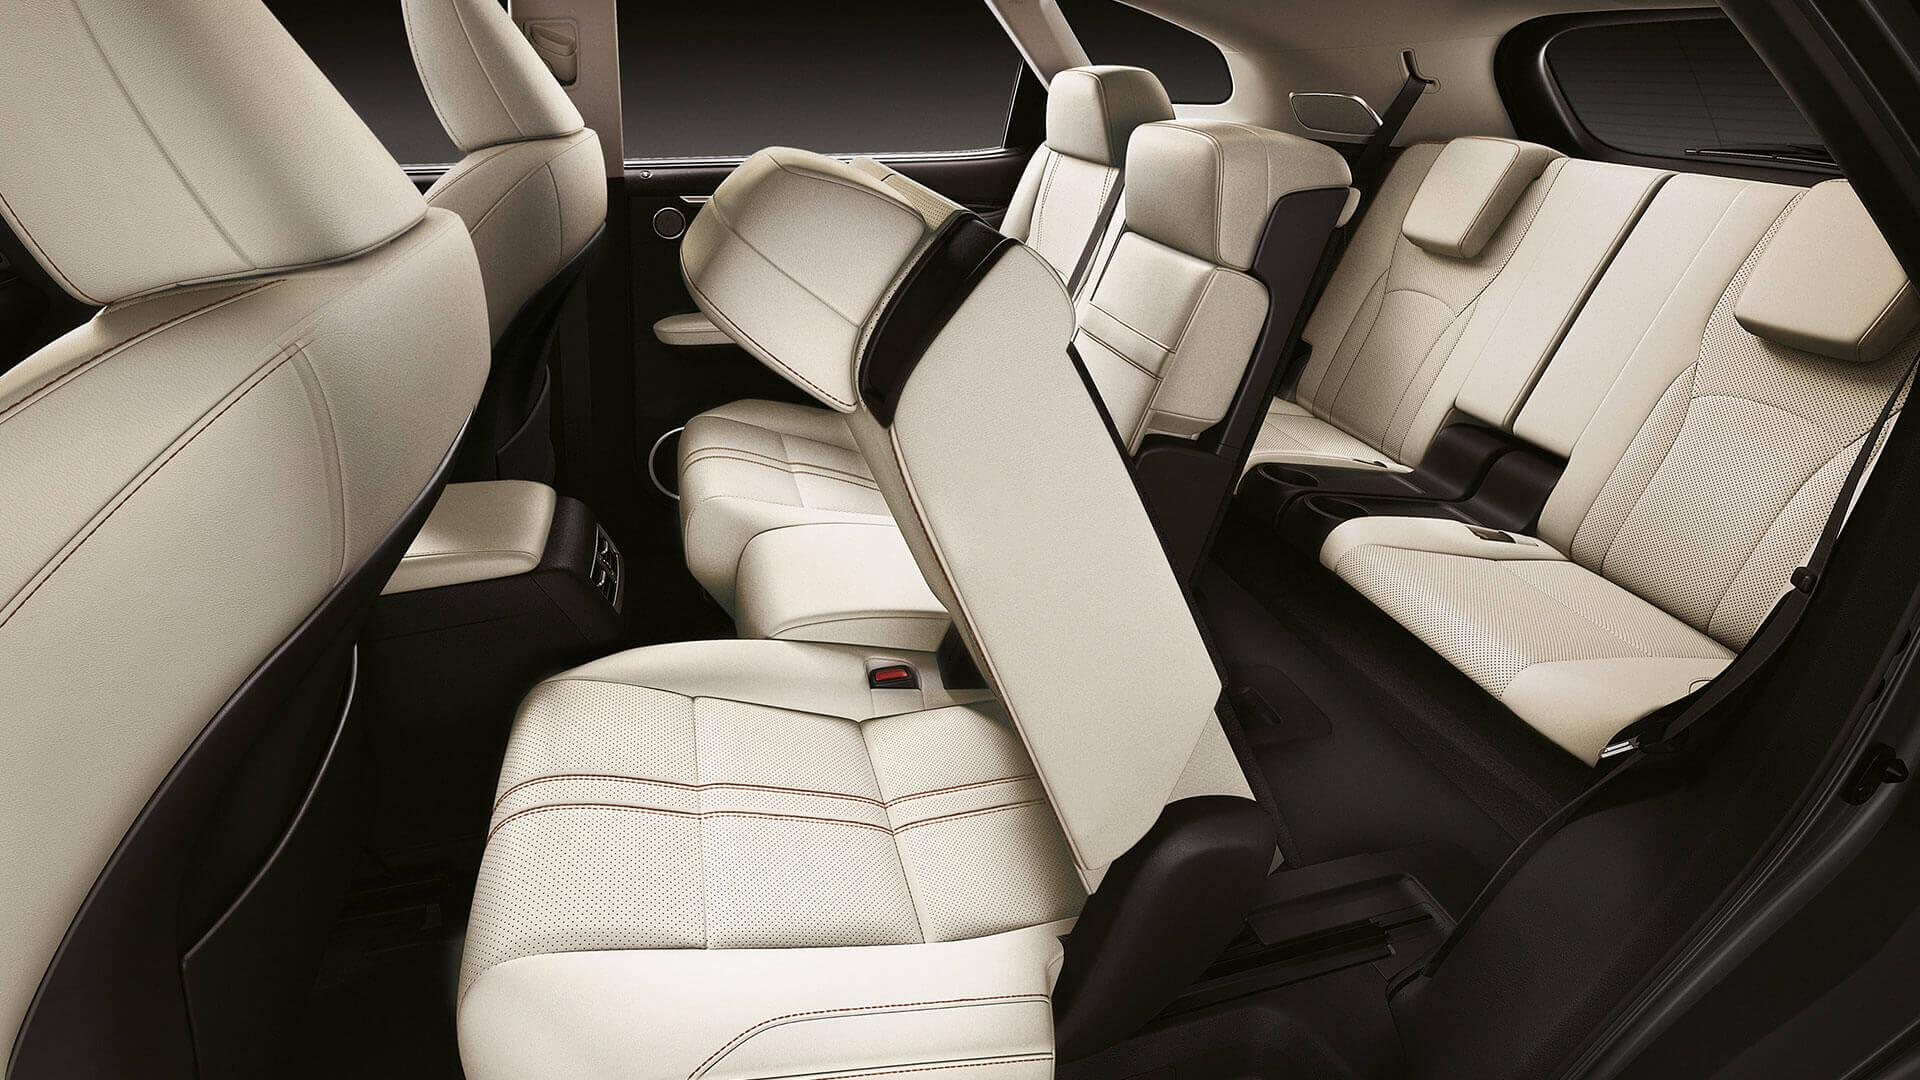 2019 lexus rxl hotspot third row seating